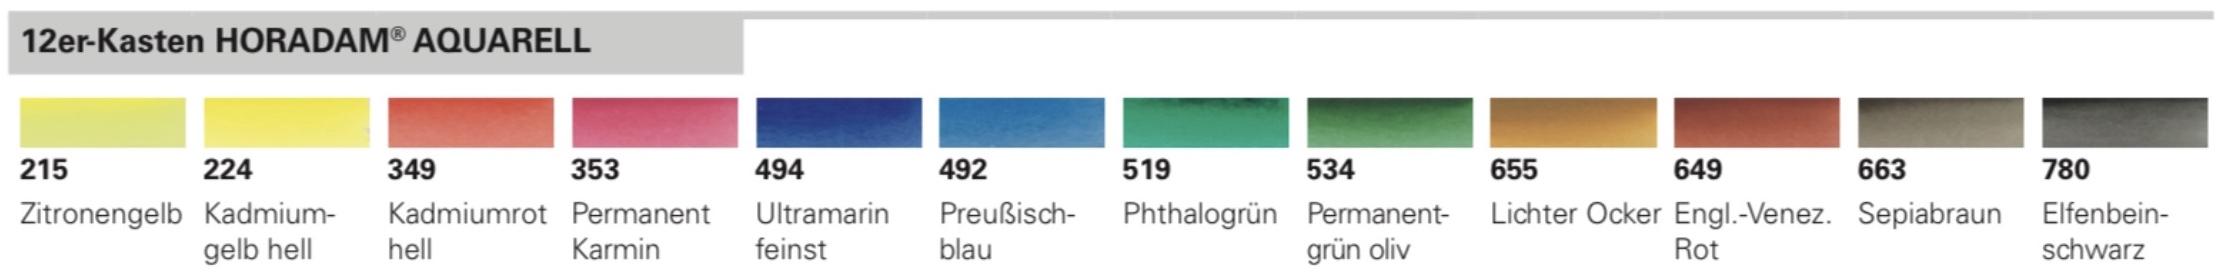 Schmincke-HORADAM-AQUARELL-Farbtoene-12er-Kasten